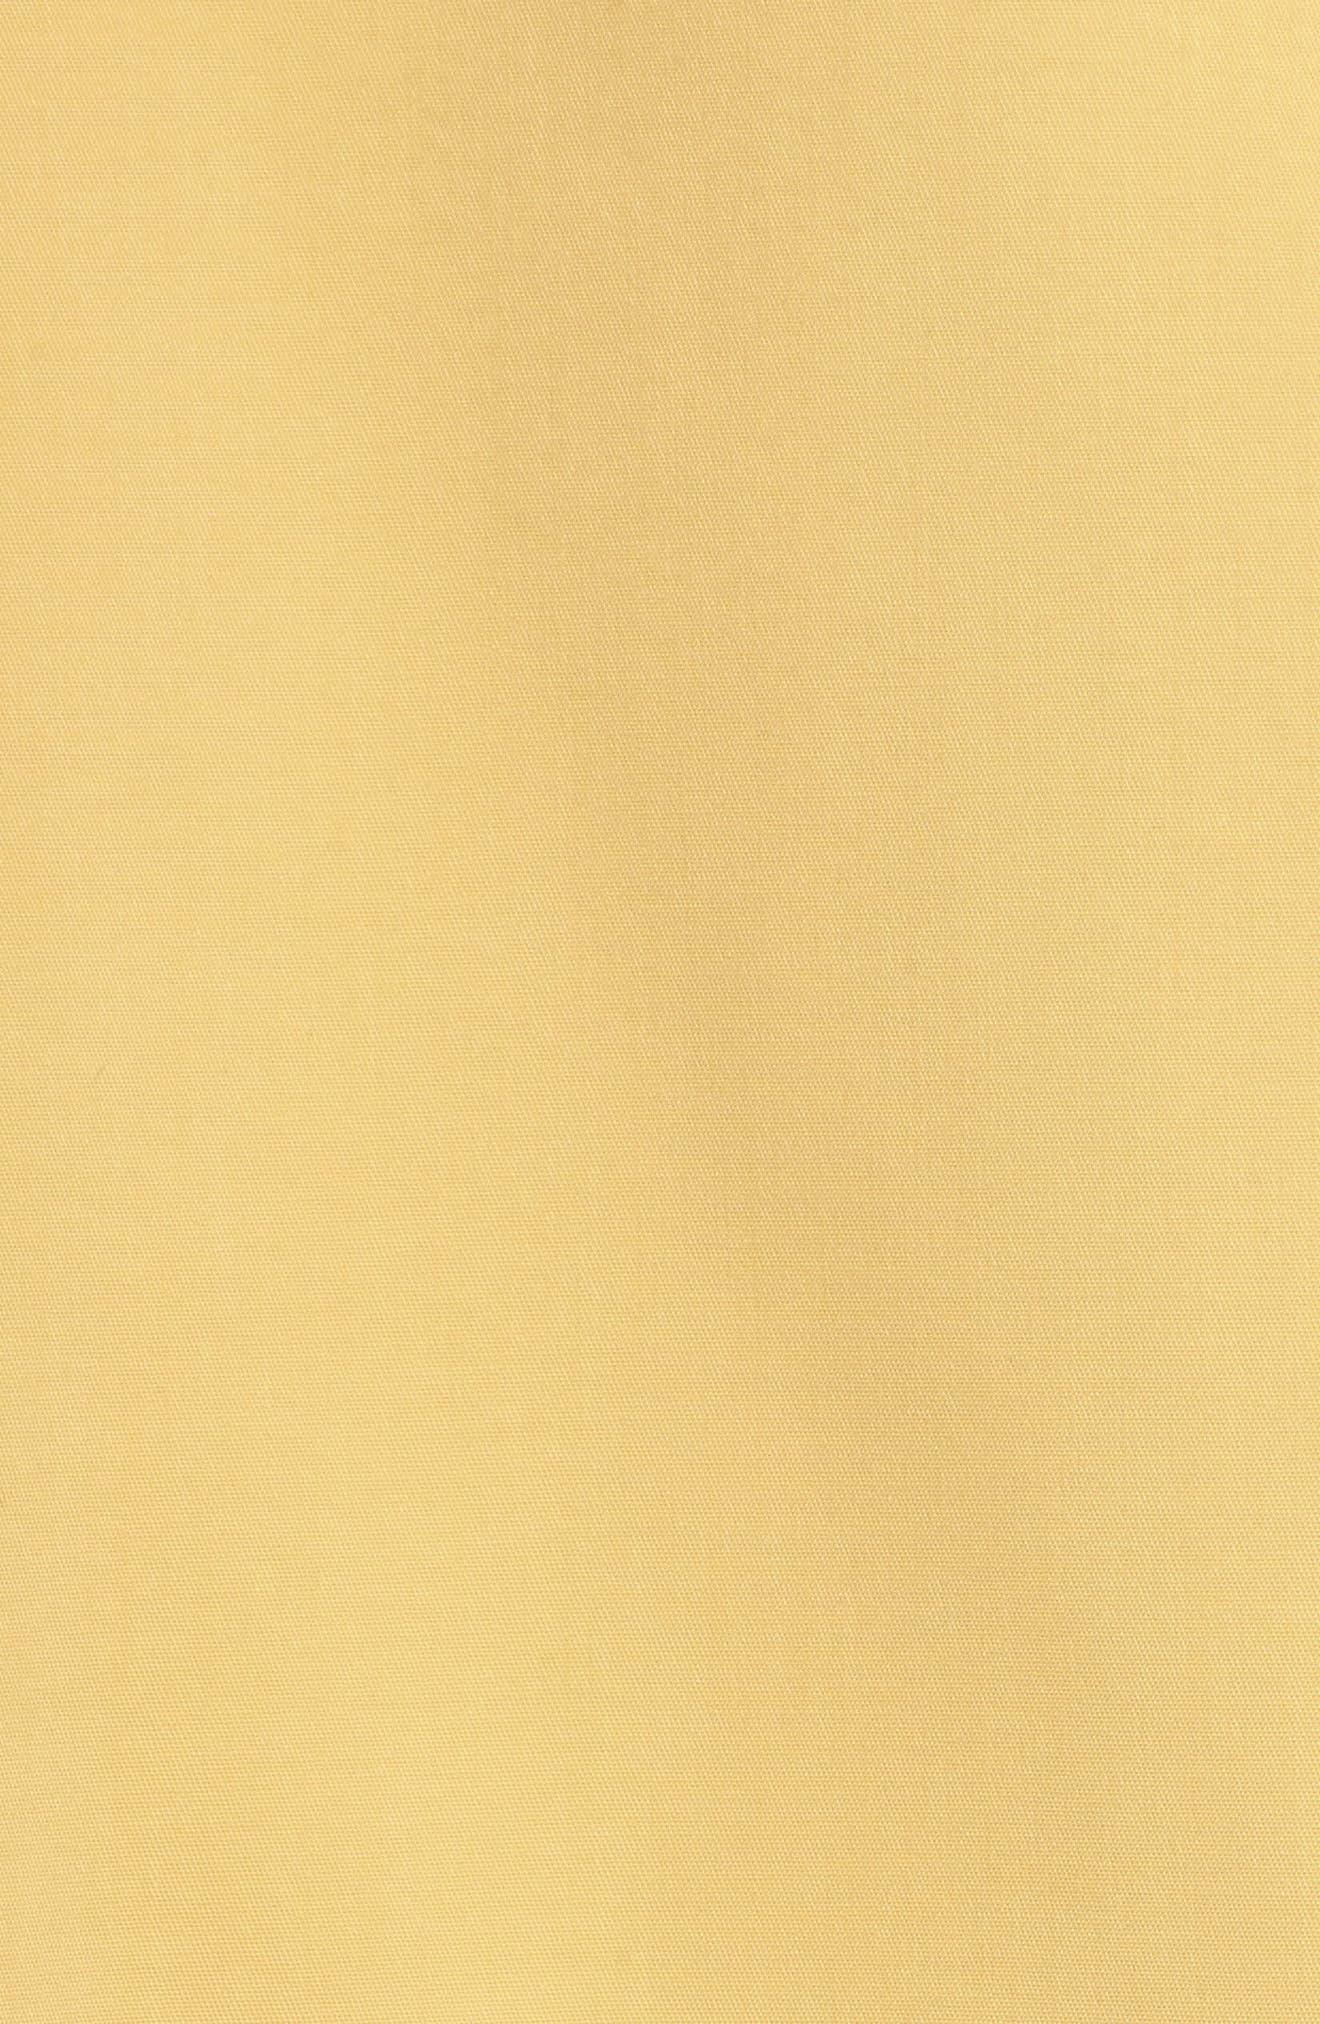 Milo Zip Jacket,                             Alternate thumbnail 5, color,                             Sienna Yellow